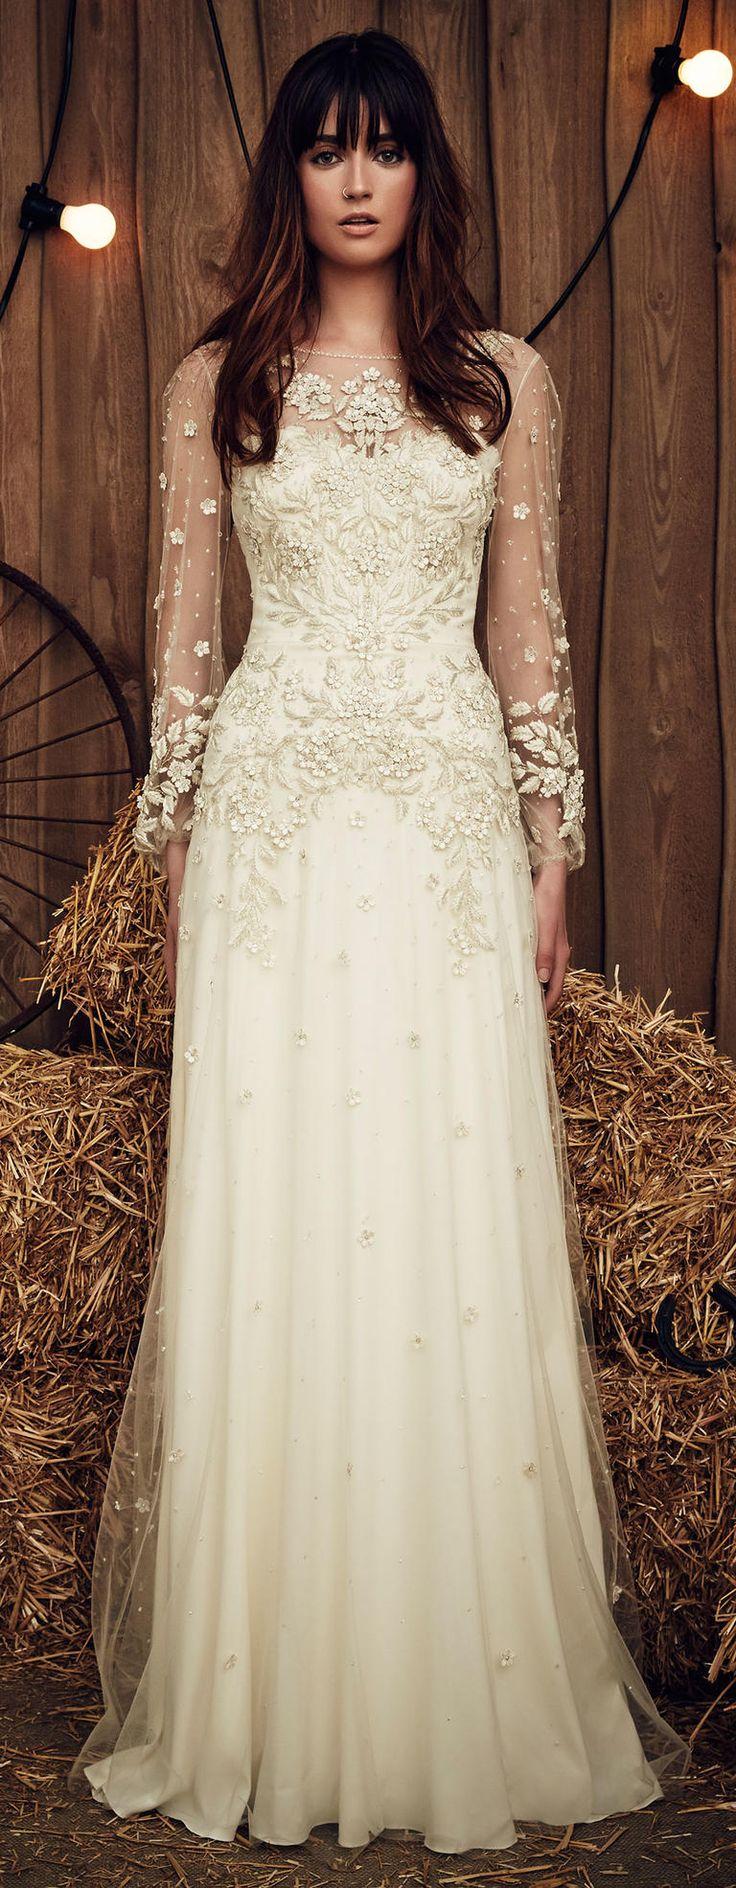 gypsy wedding dresses cheap ivory wedding dresses Celadon Green Hits the Runway at Jenny Packham s Gypsy Inspired Spring Show Jenny Packham BridalJenny Packham Wedding DressesIvory